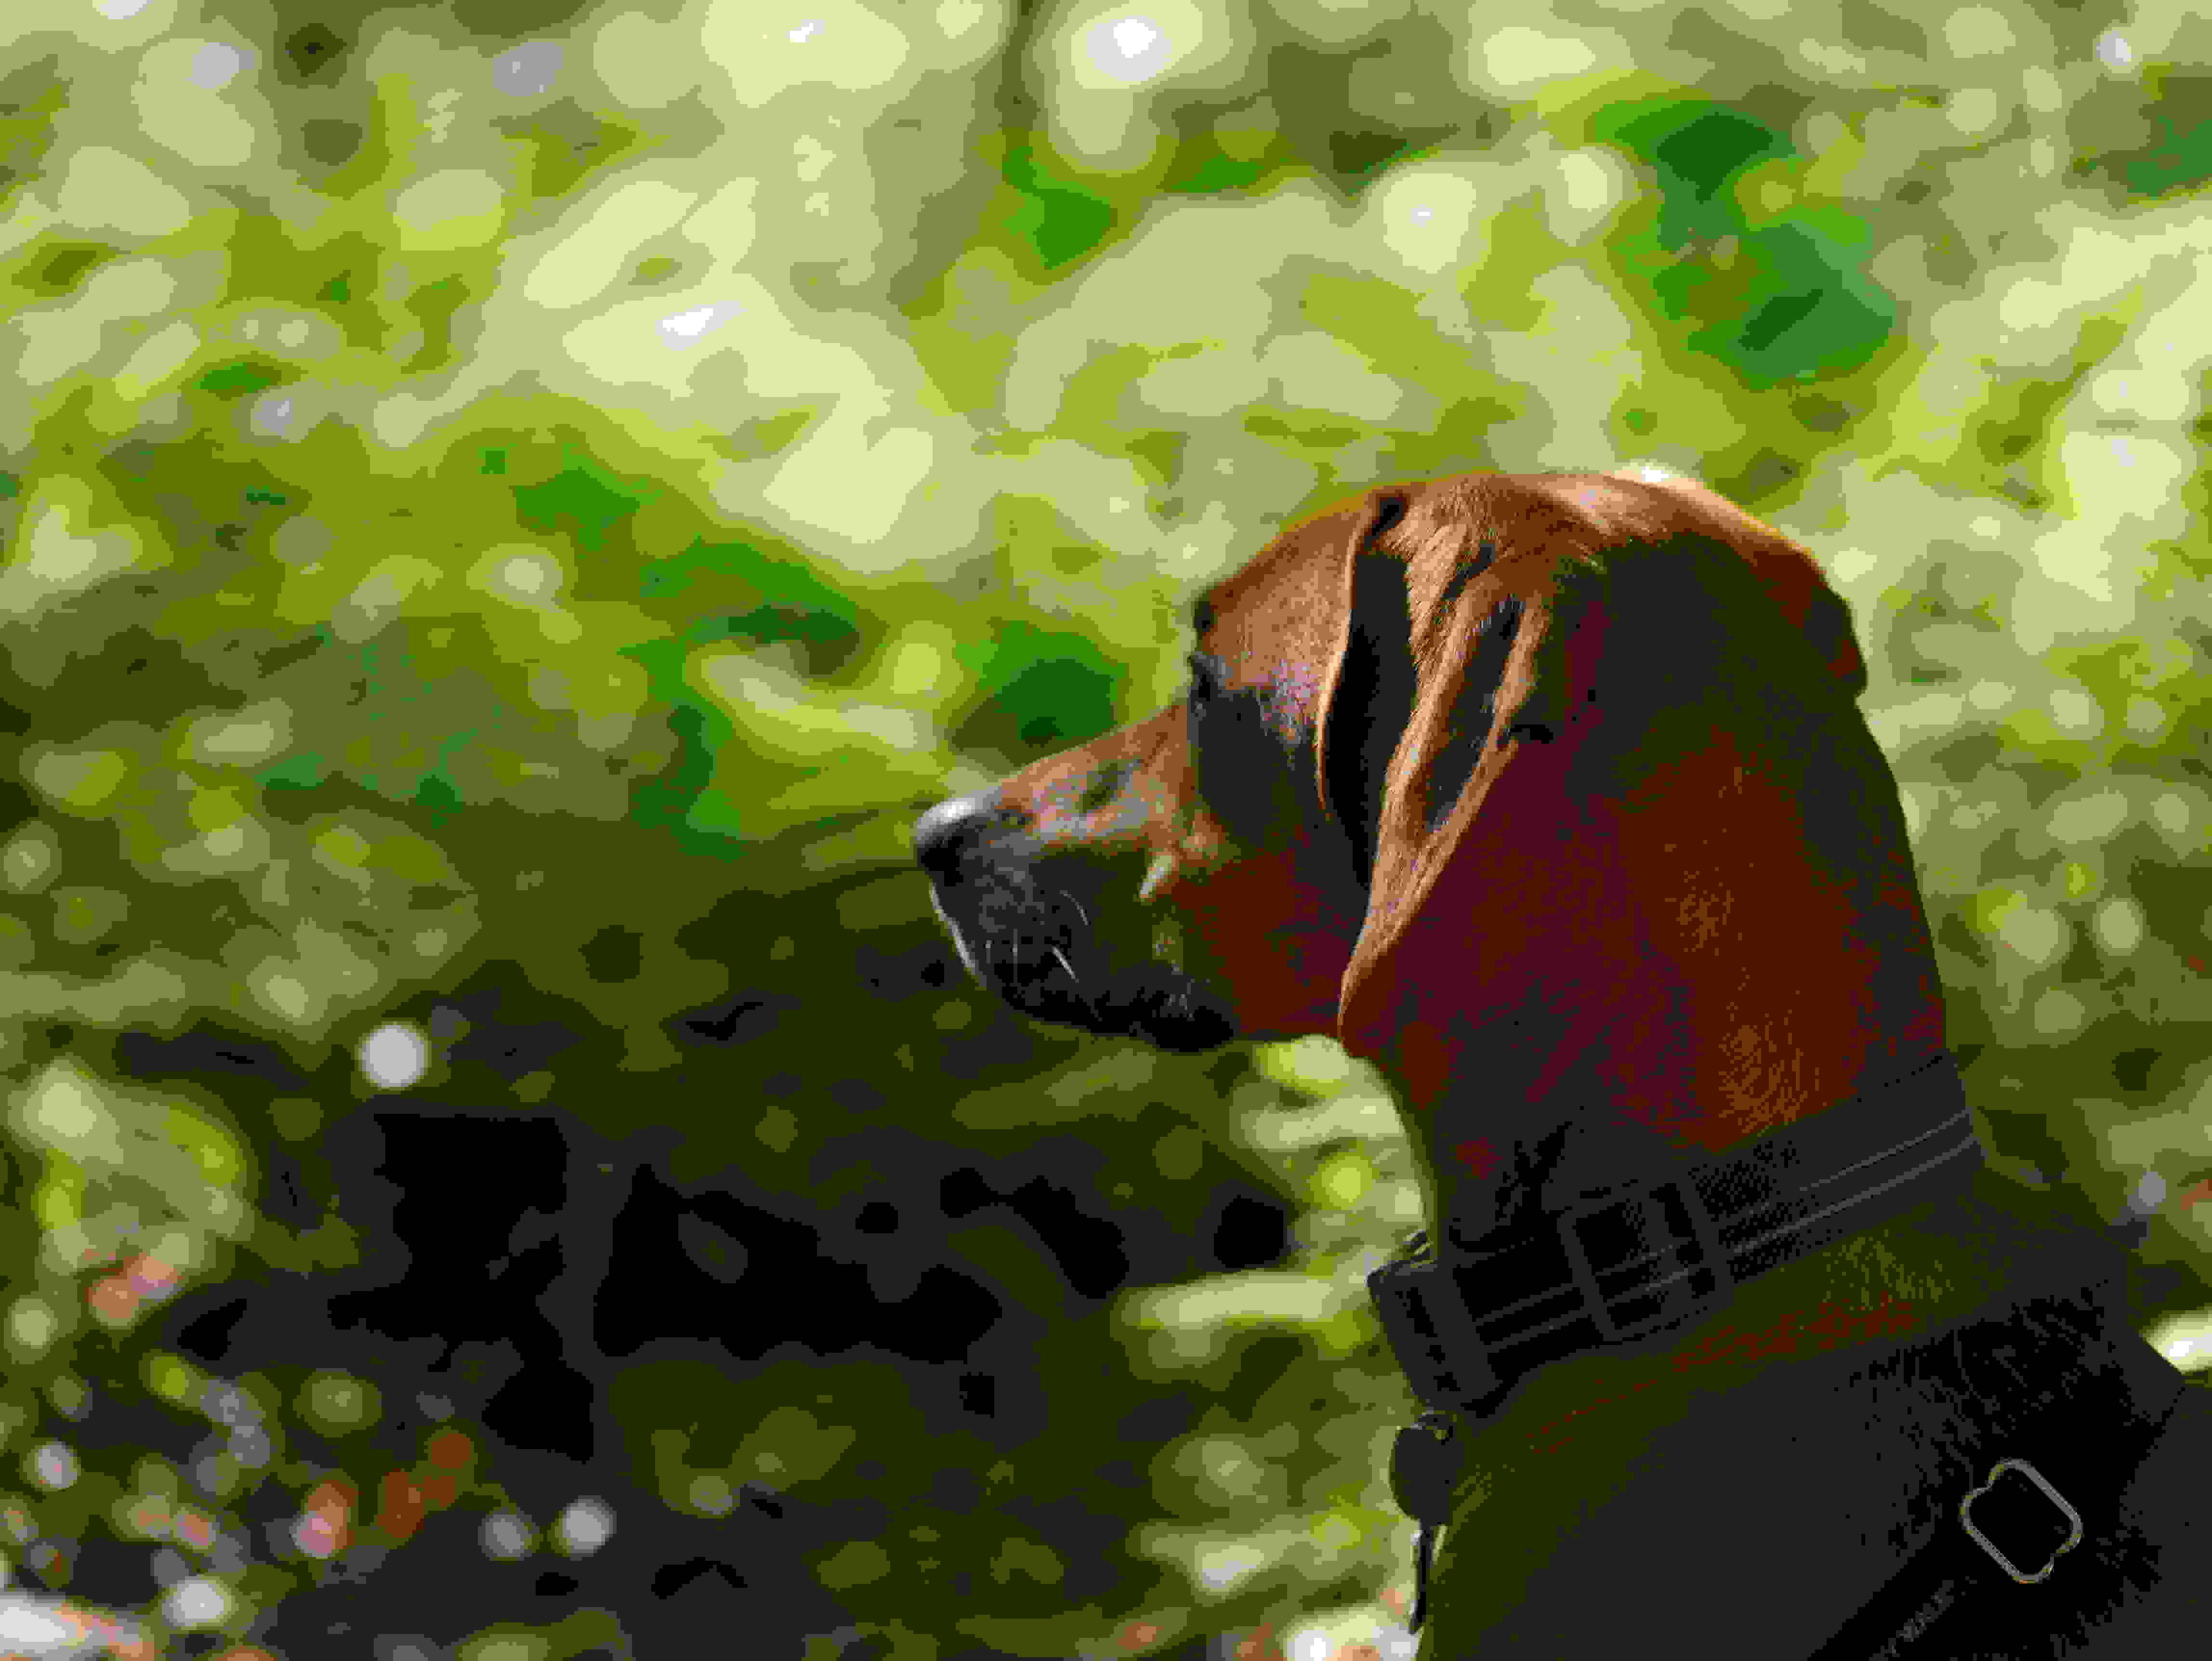 A photo taken by the Panasonic Lumix G7 of a dog.